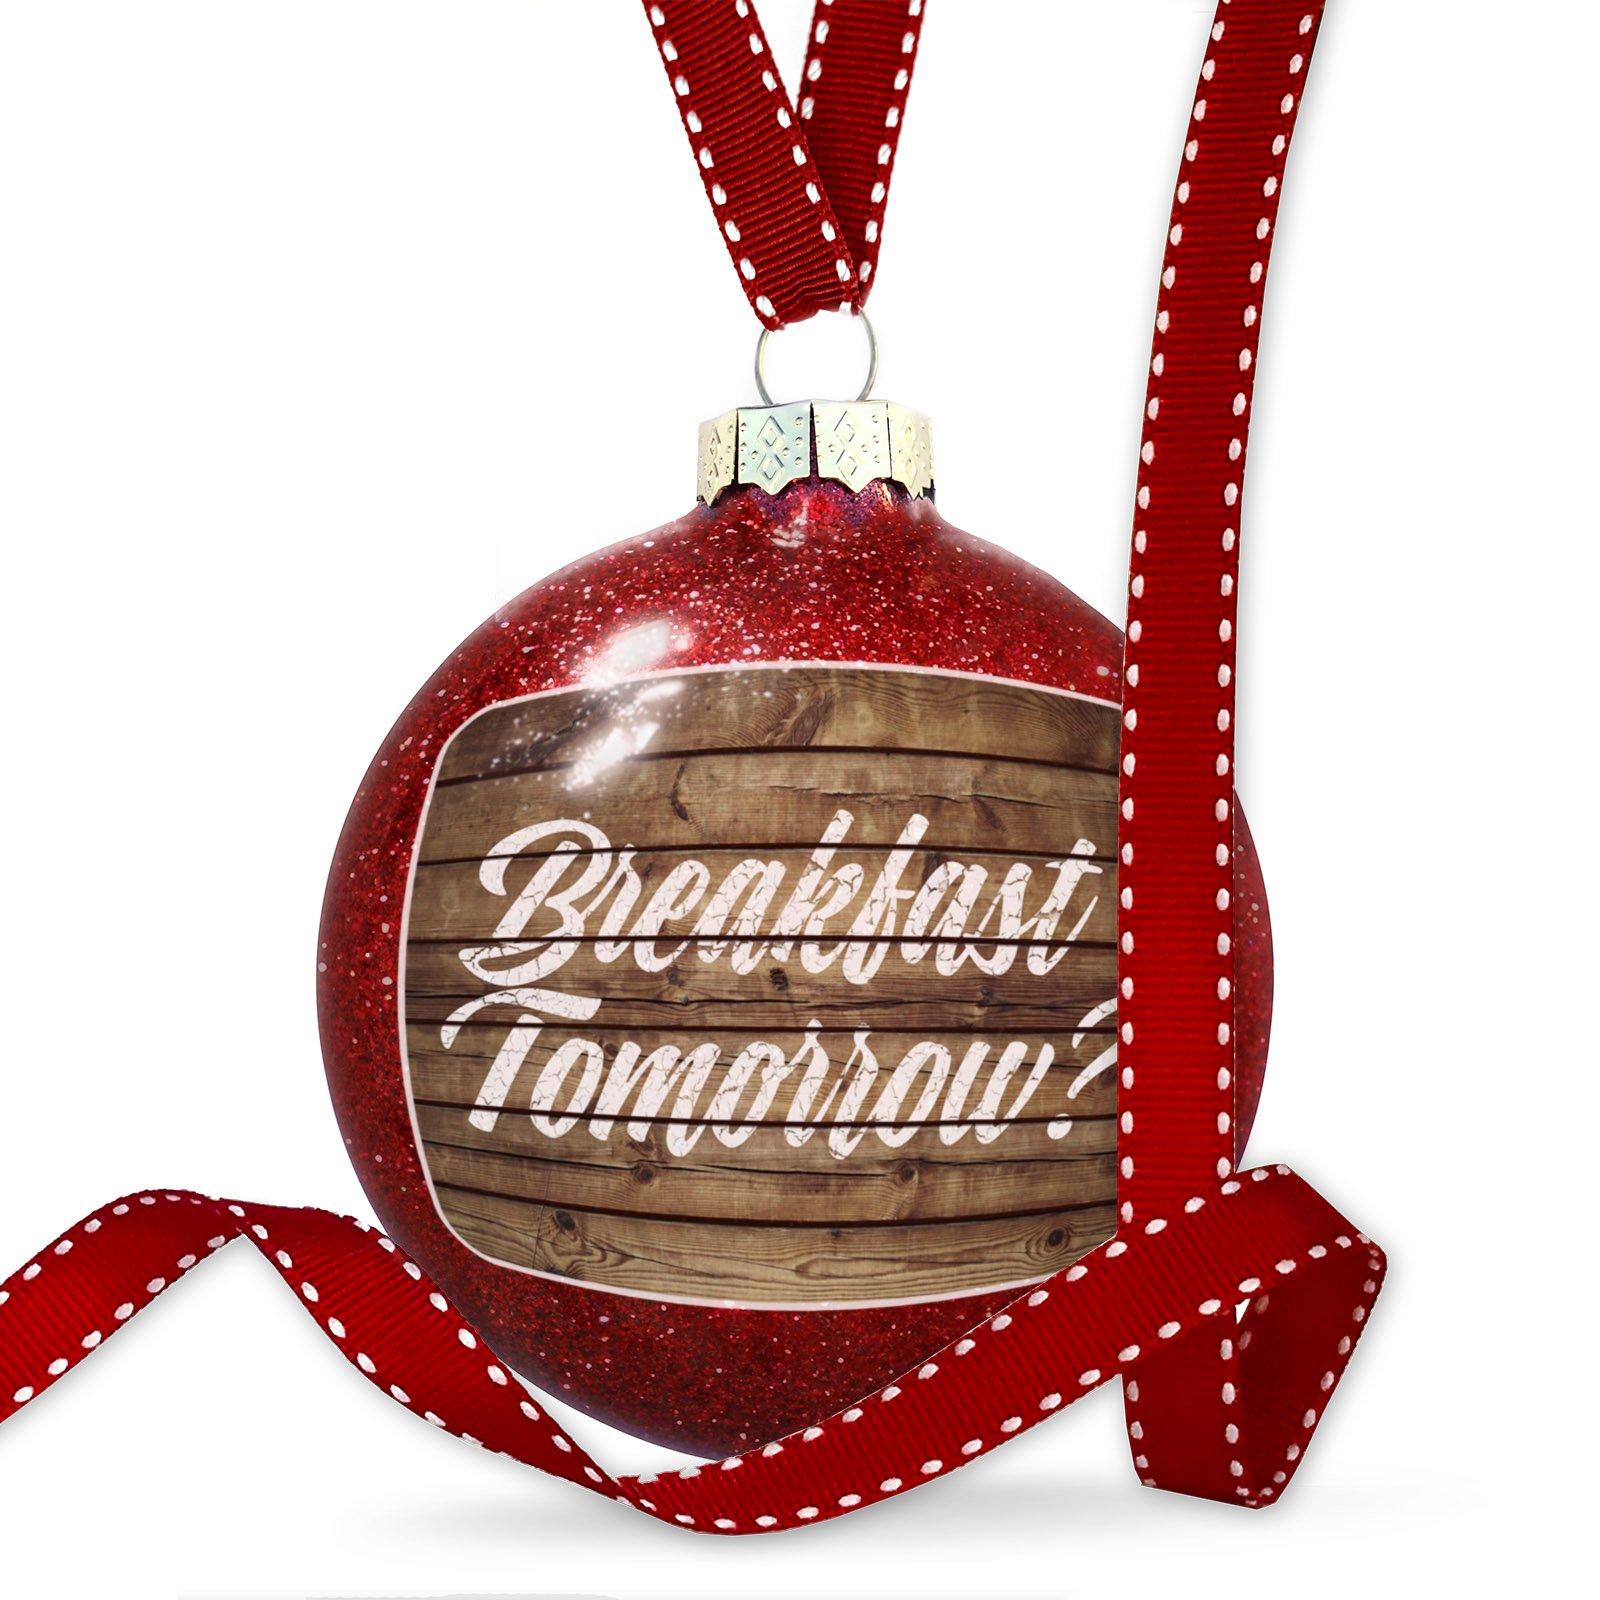 Christmas Decoration Painted Wood Breakfast Tomorrow? Ornament